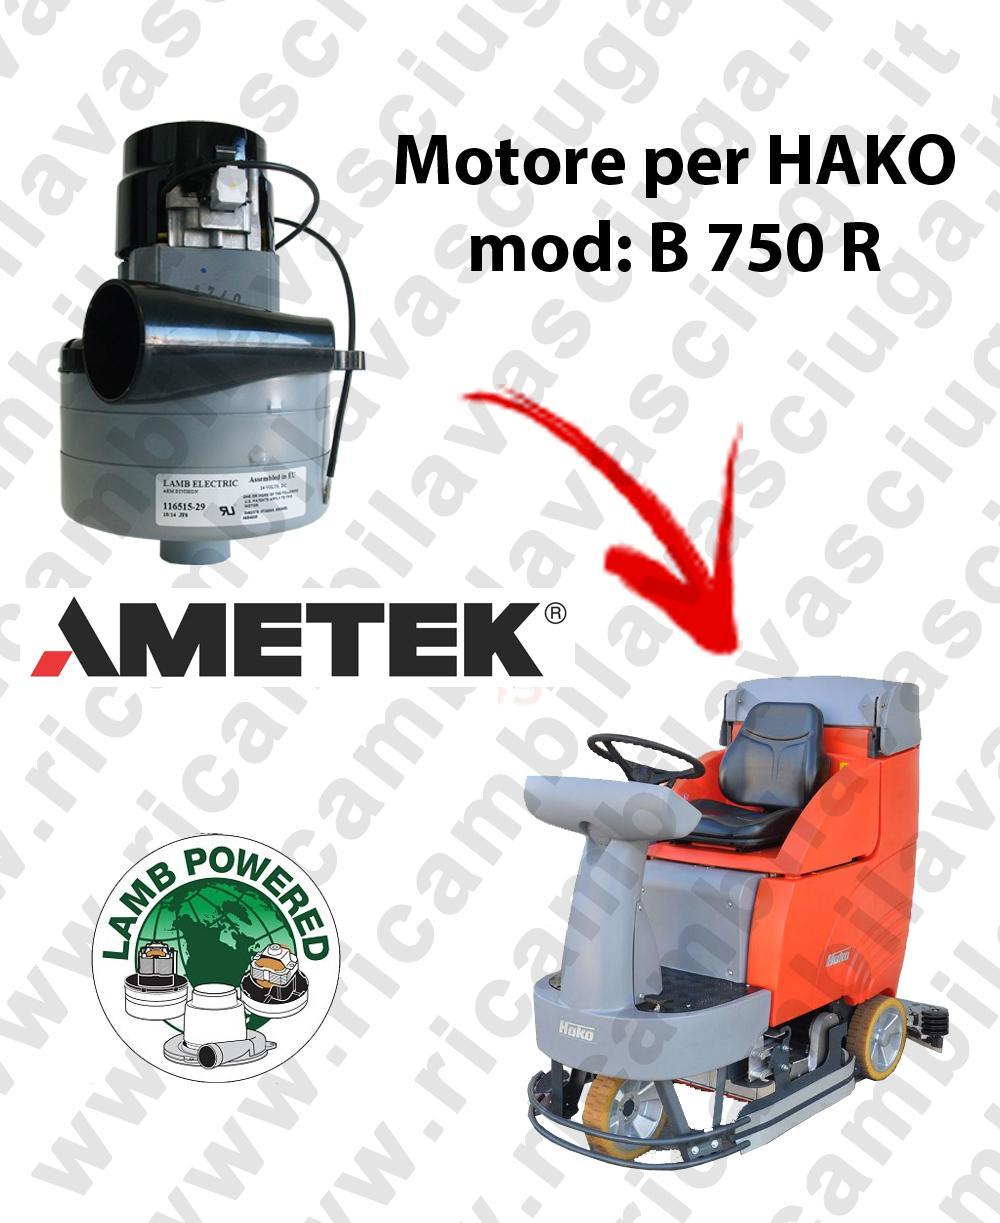 B 750 R Motore de aspiración LAMB AMETEK para fregadora HAKO